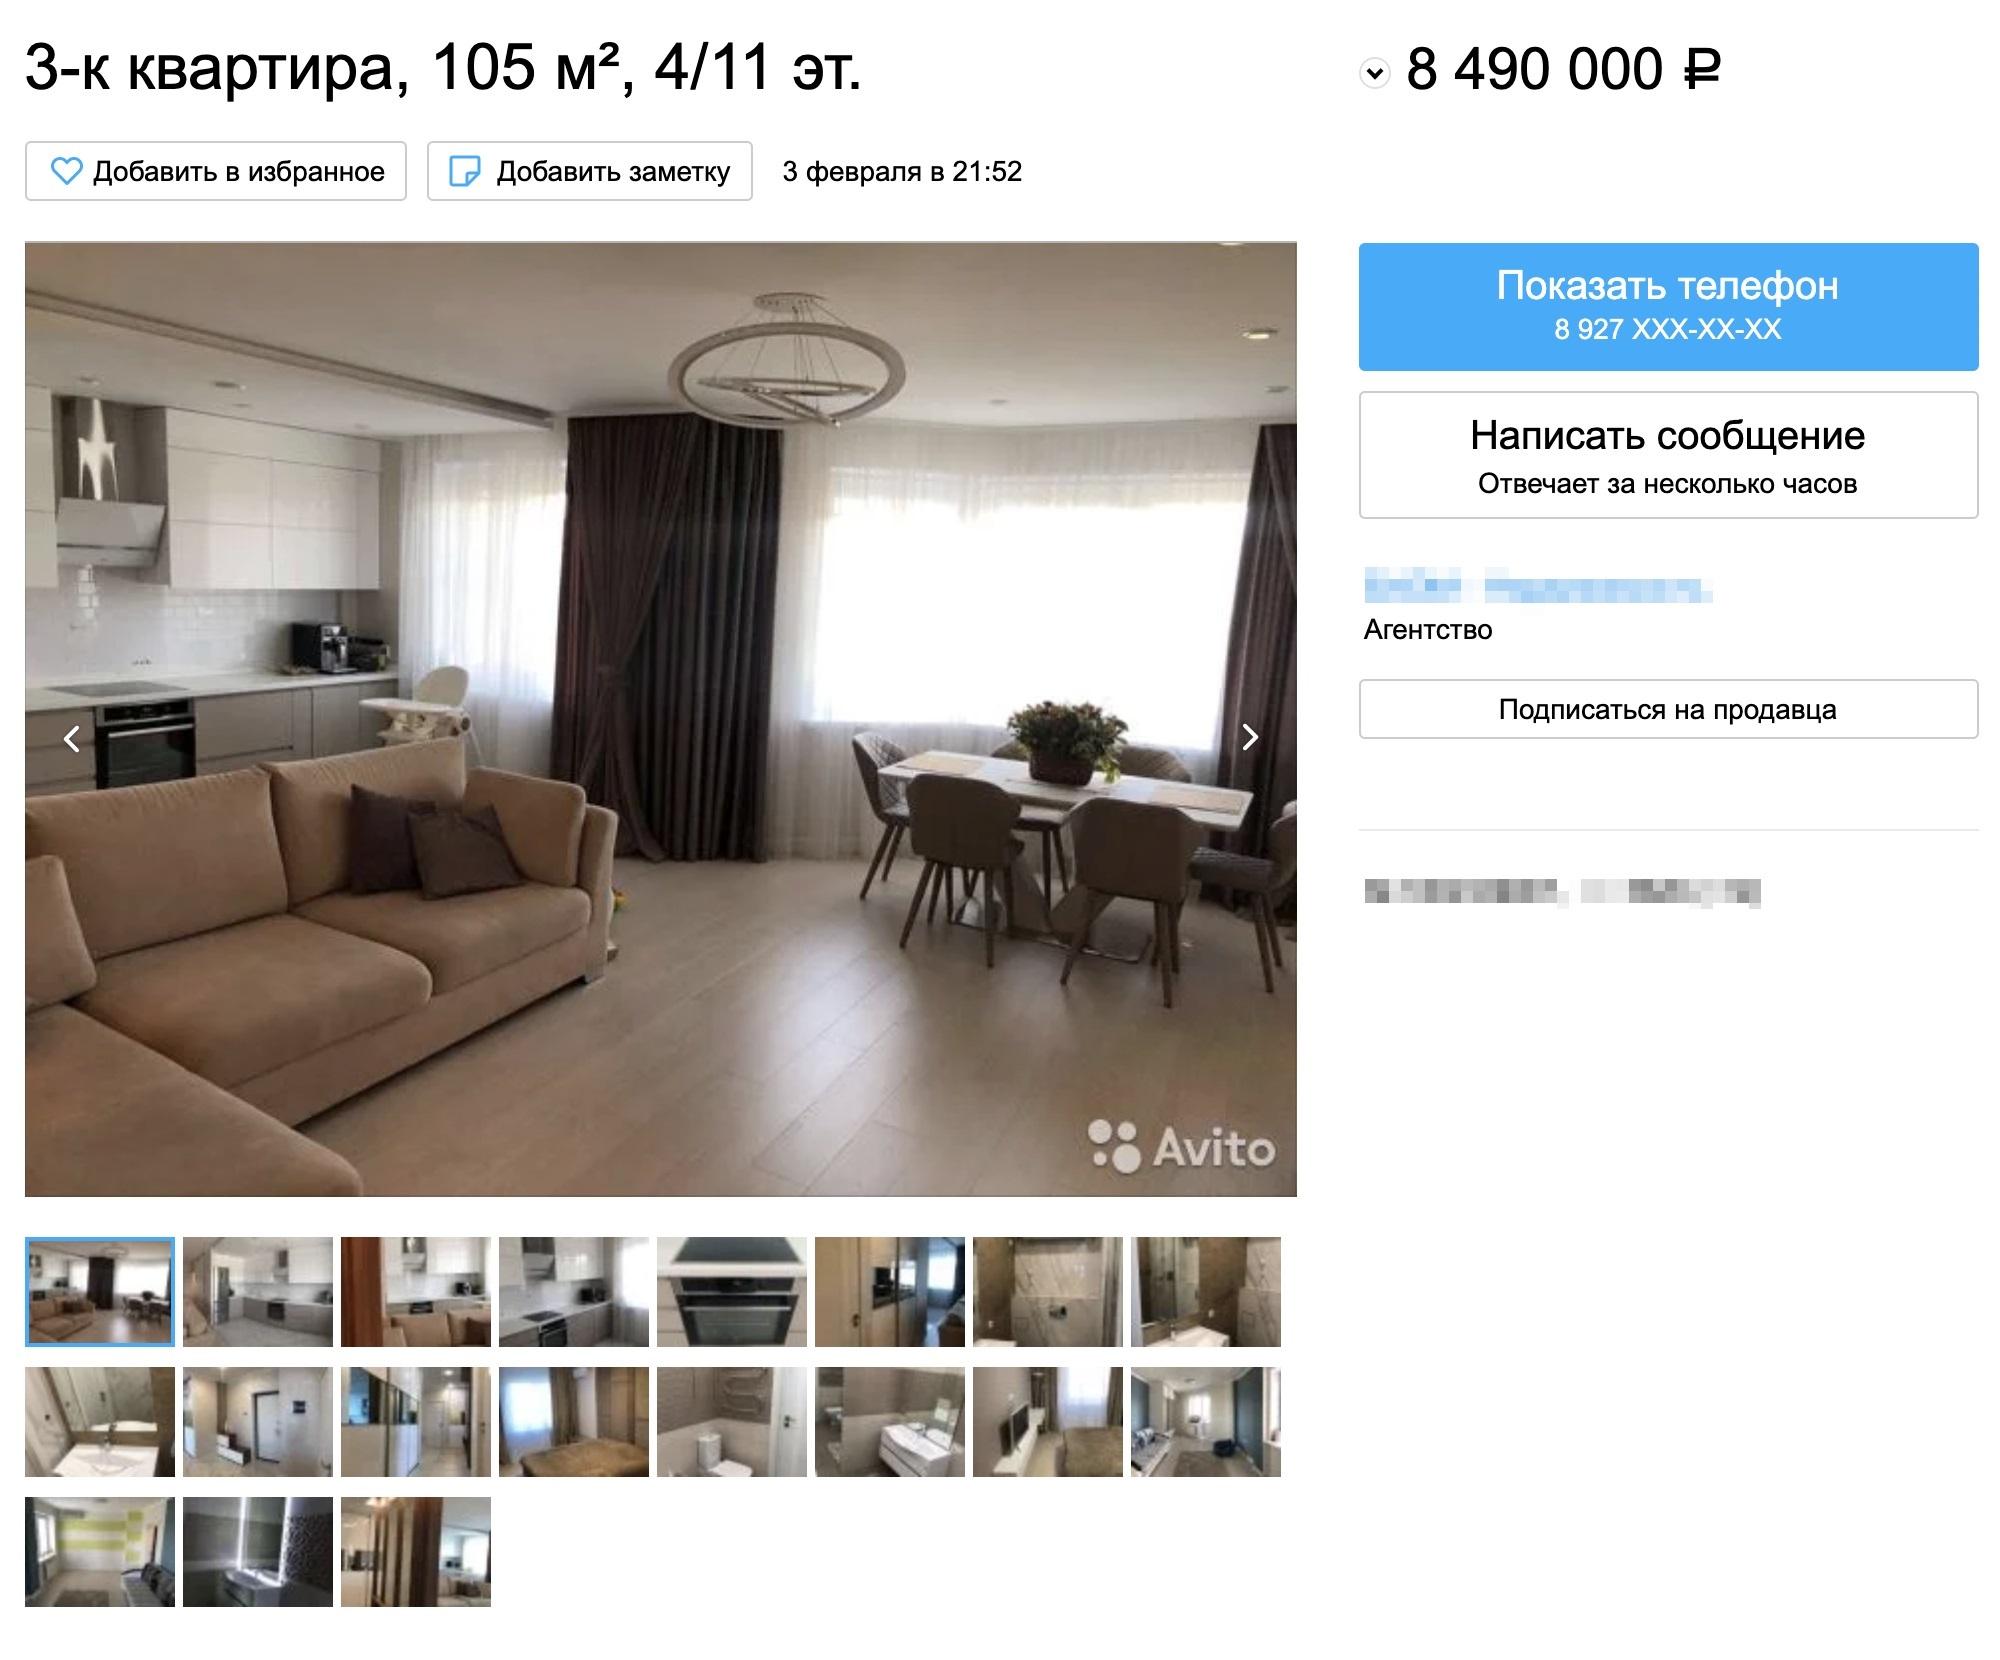 Одна из квартир в элитном доме — почти 81 000<span class=ruble>Р</span> за 1 м²